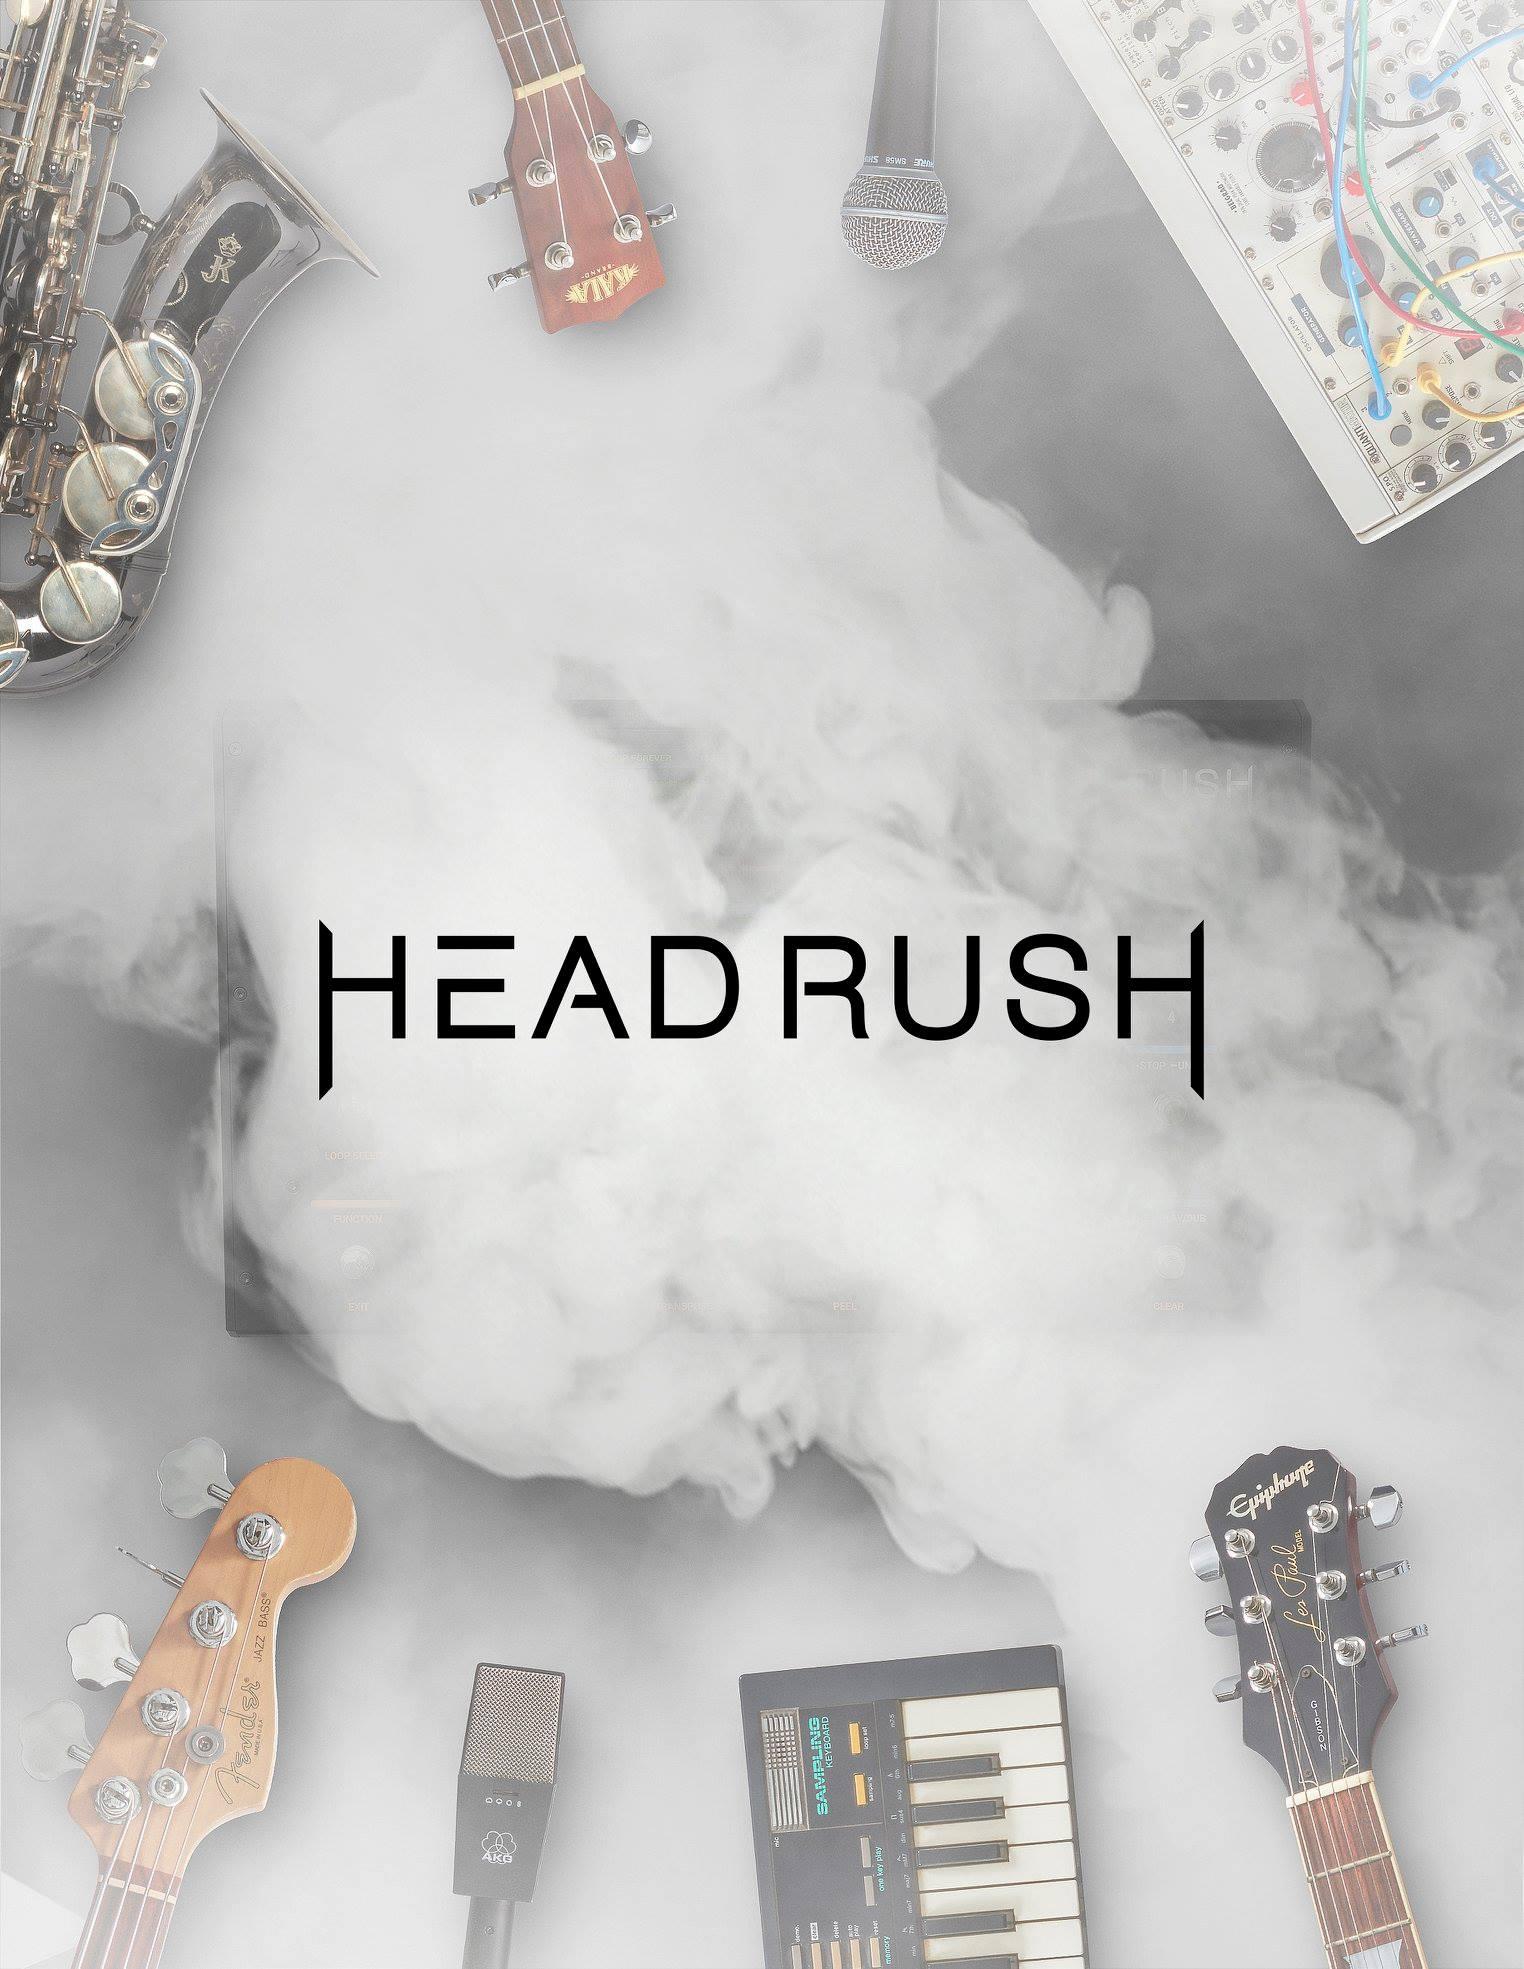 Headrush New Product TEaser